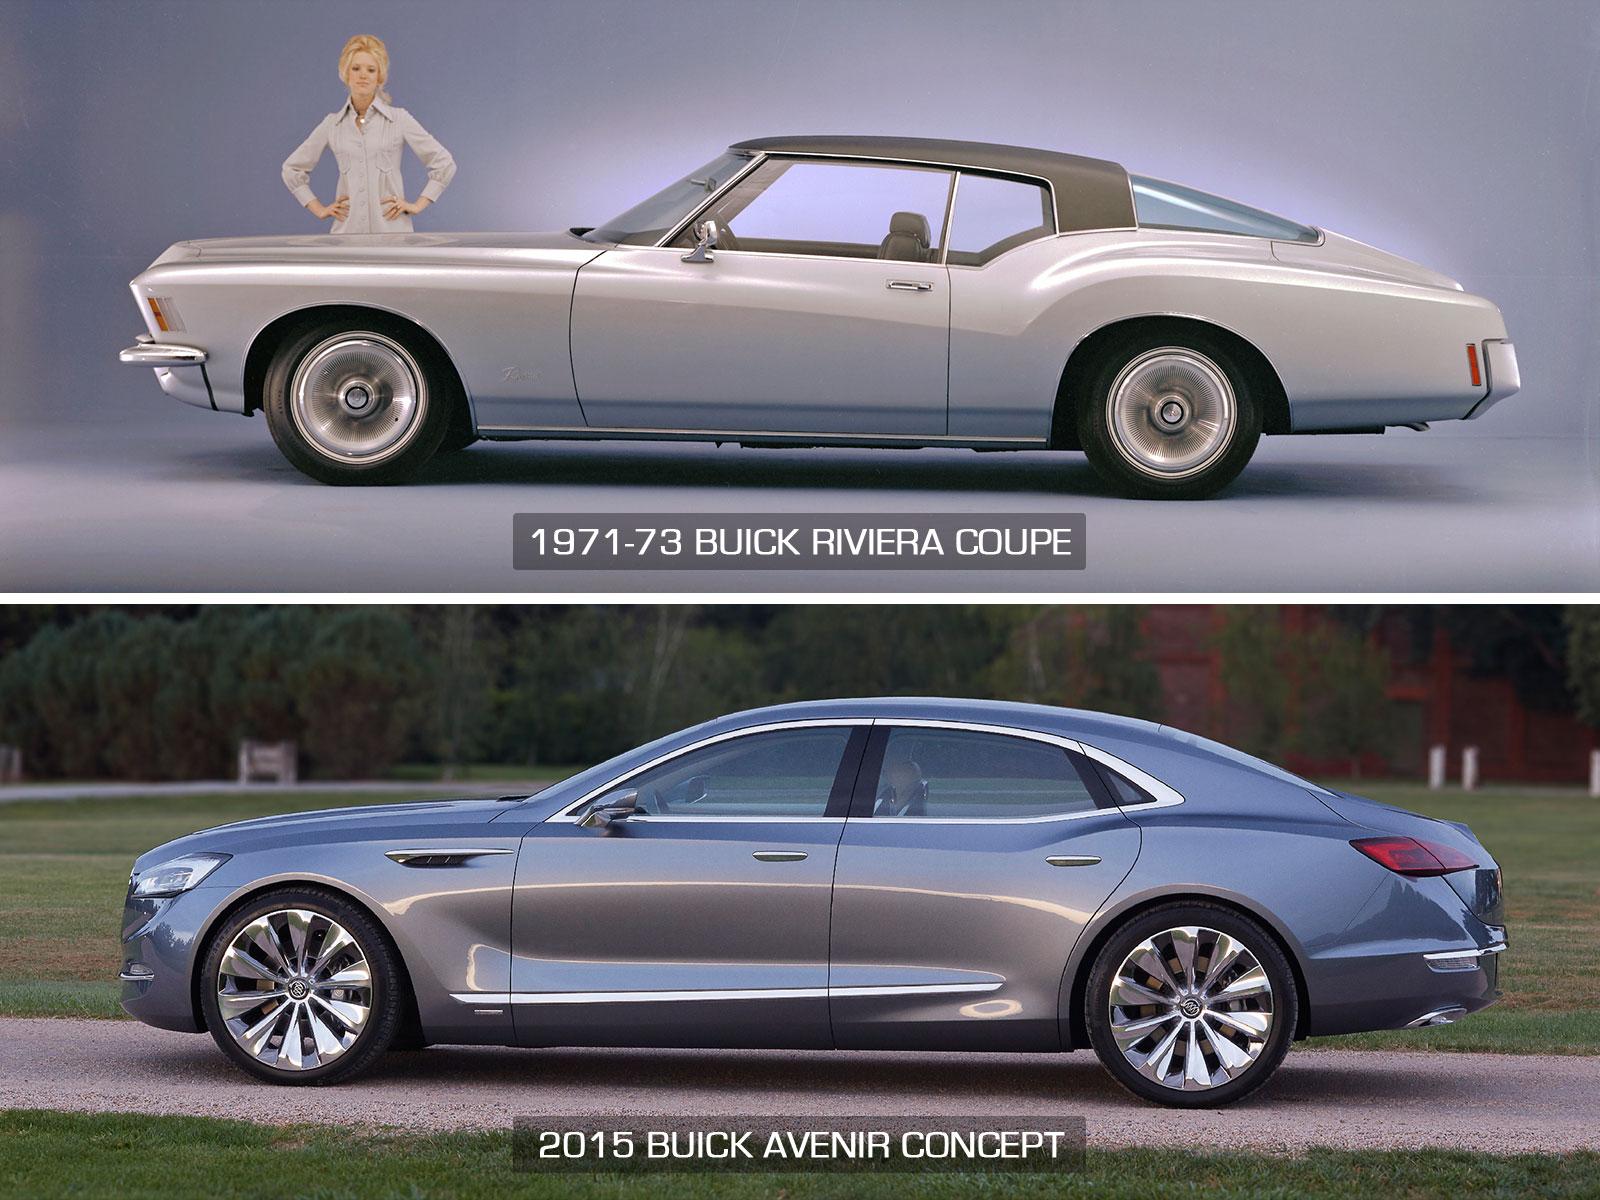 1971 Buick Riviera Coupe And 2015 Avenir Concept Profile